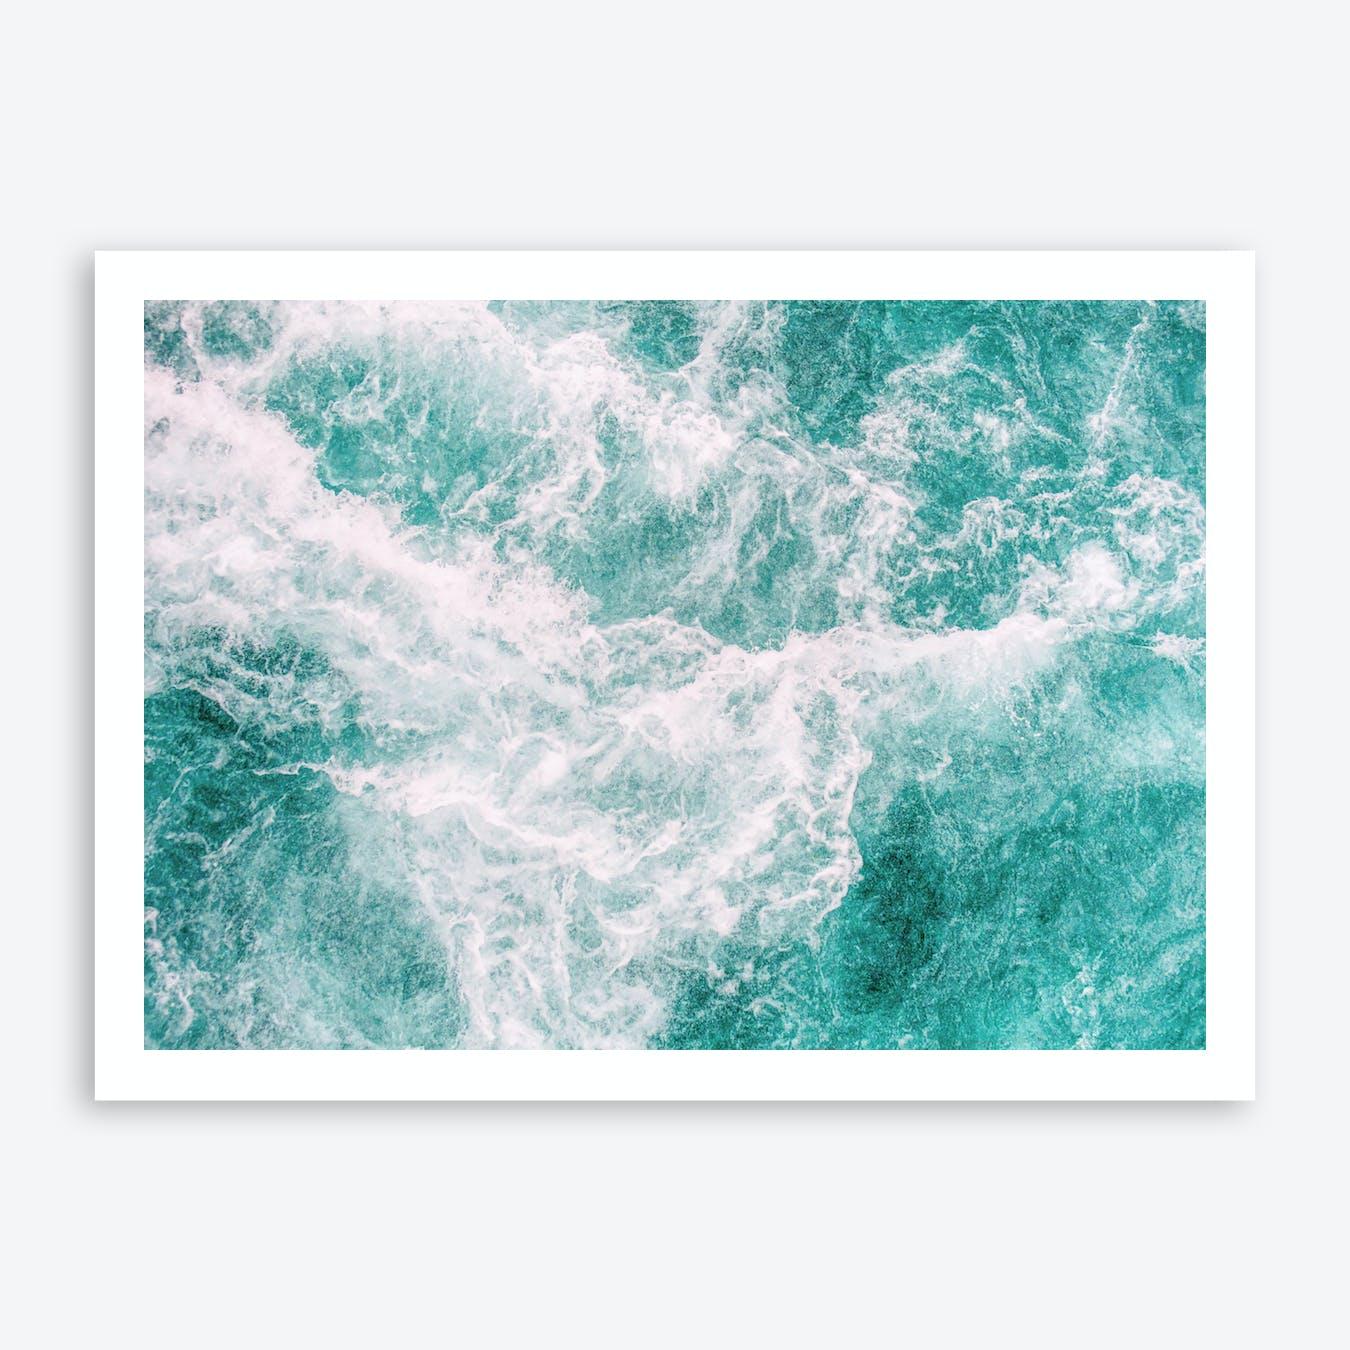 Whitewater 3